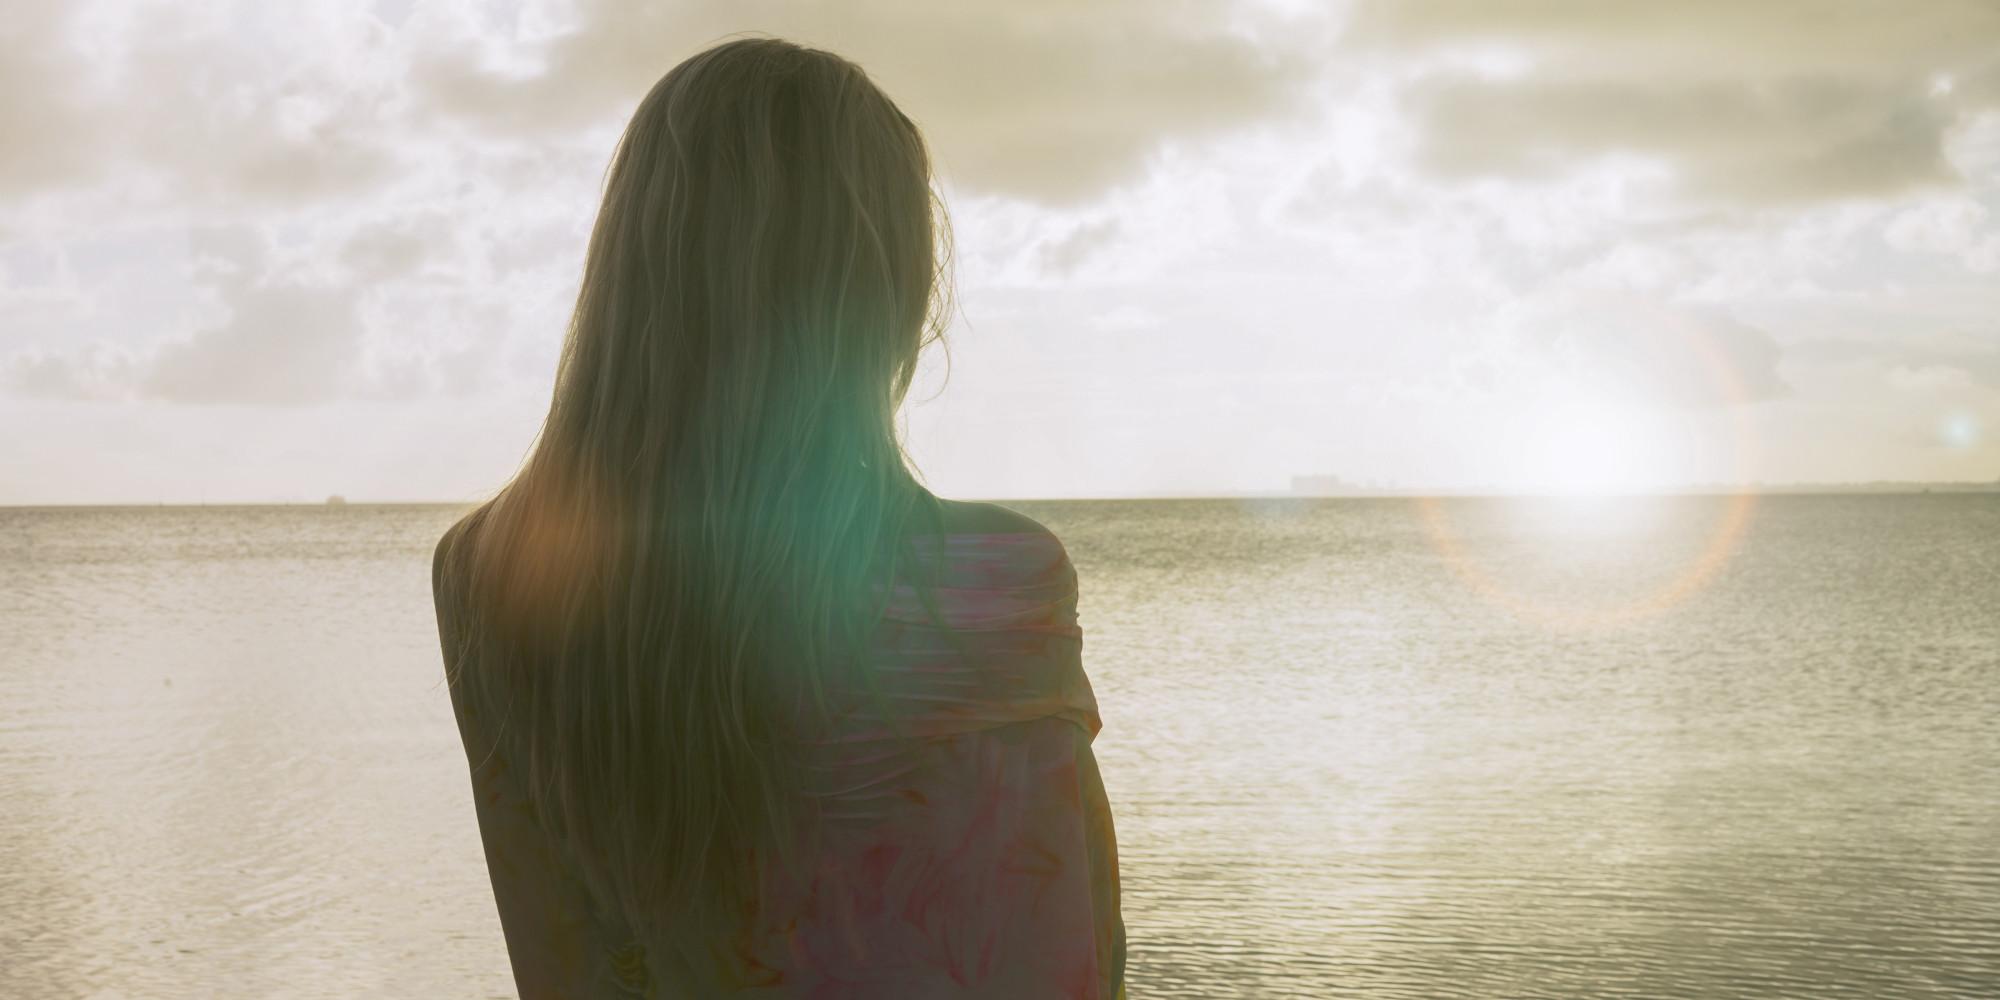 pregnant woman at the sea, tumblr-ის სურათის შედეგი